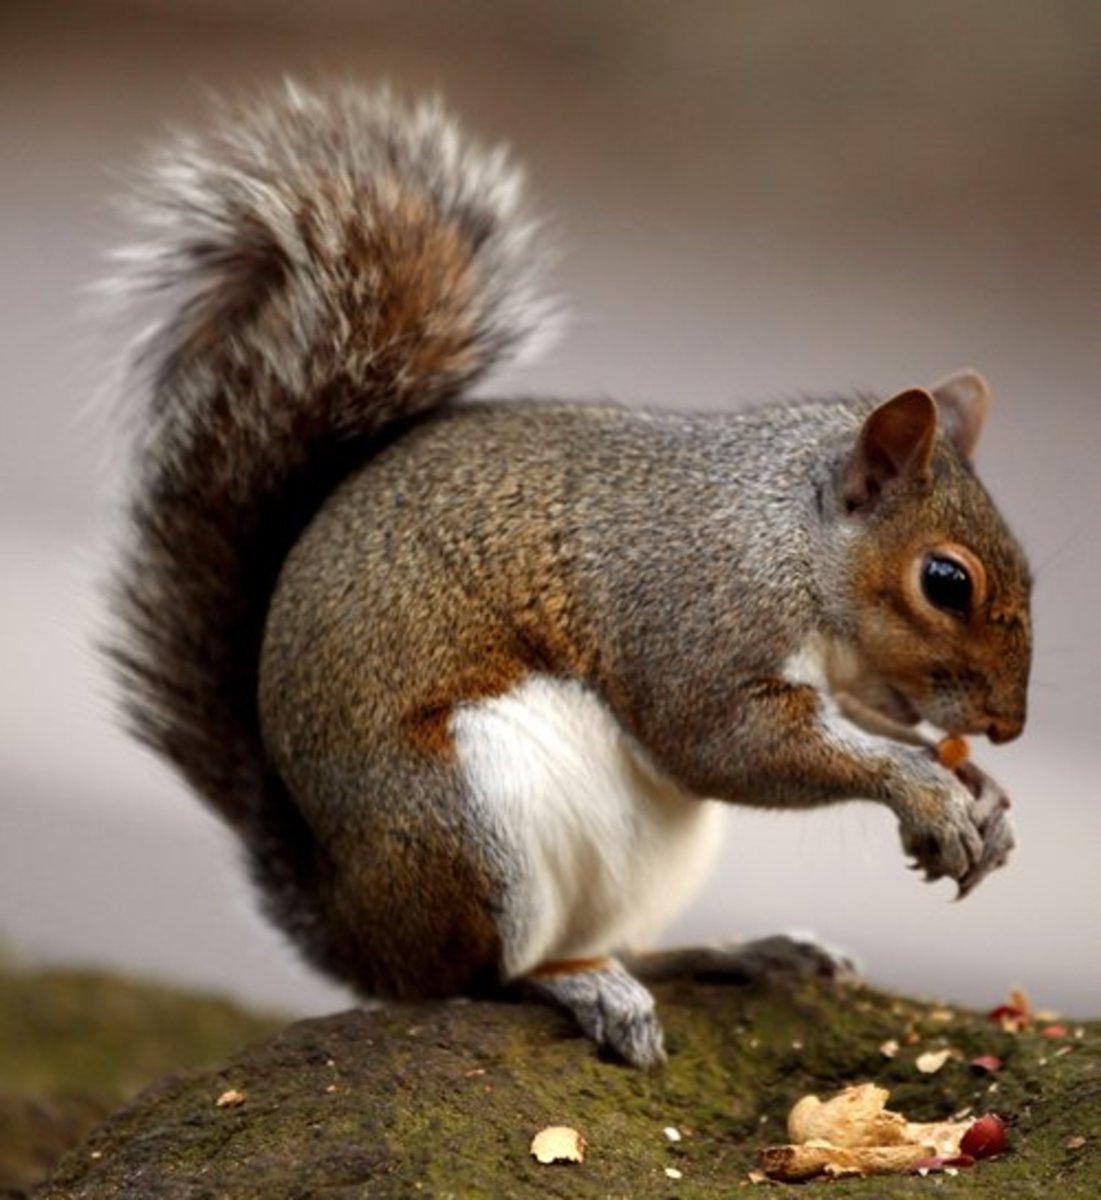 Squirrel, Pixabay, public domain